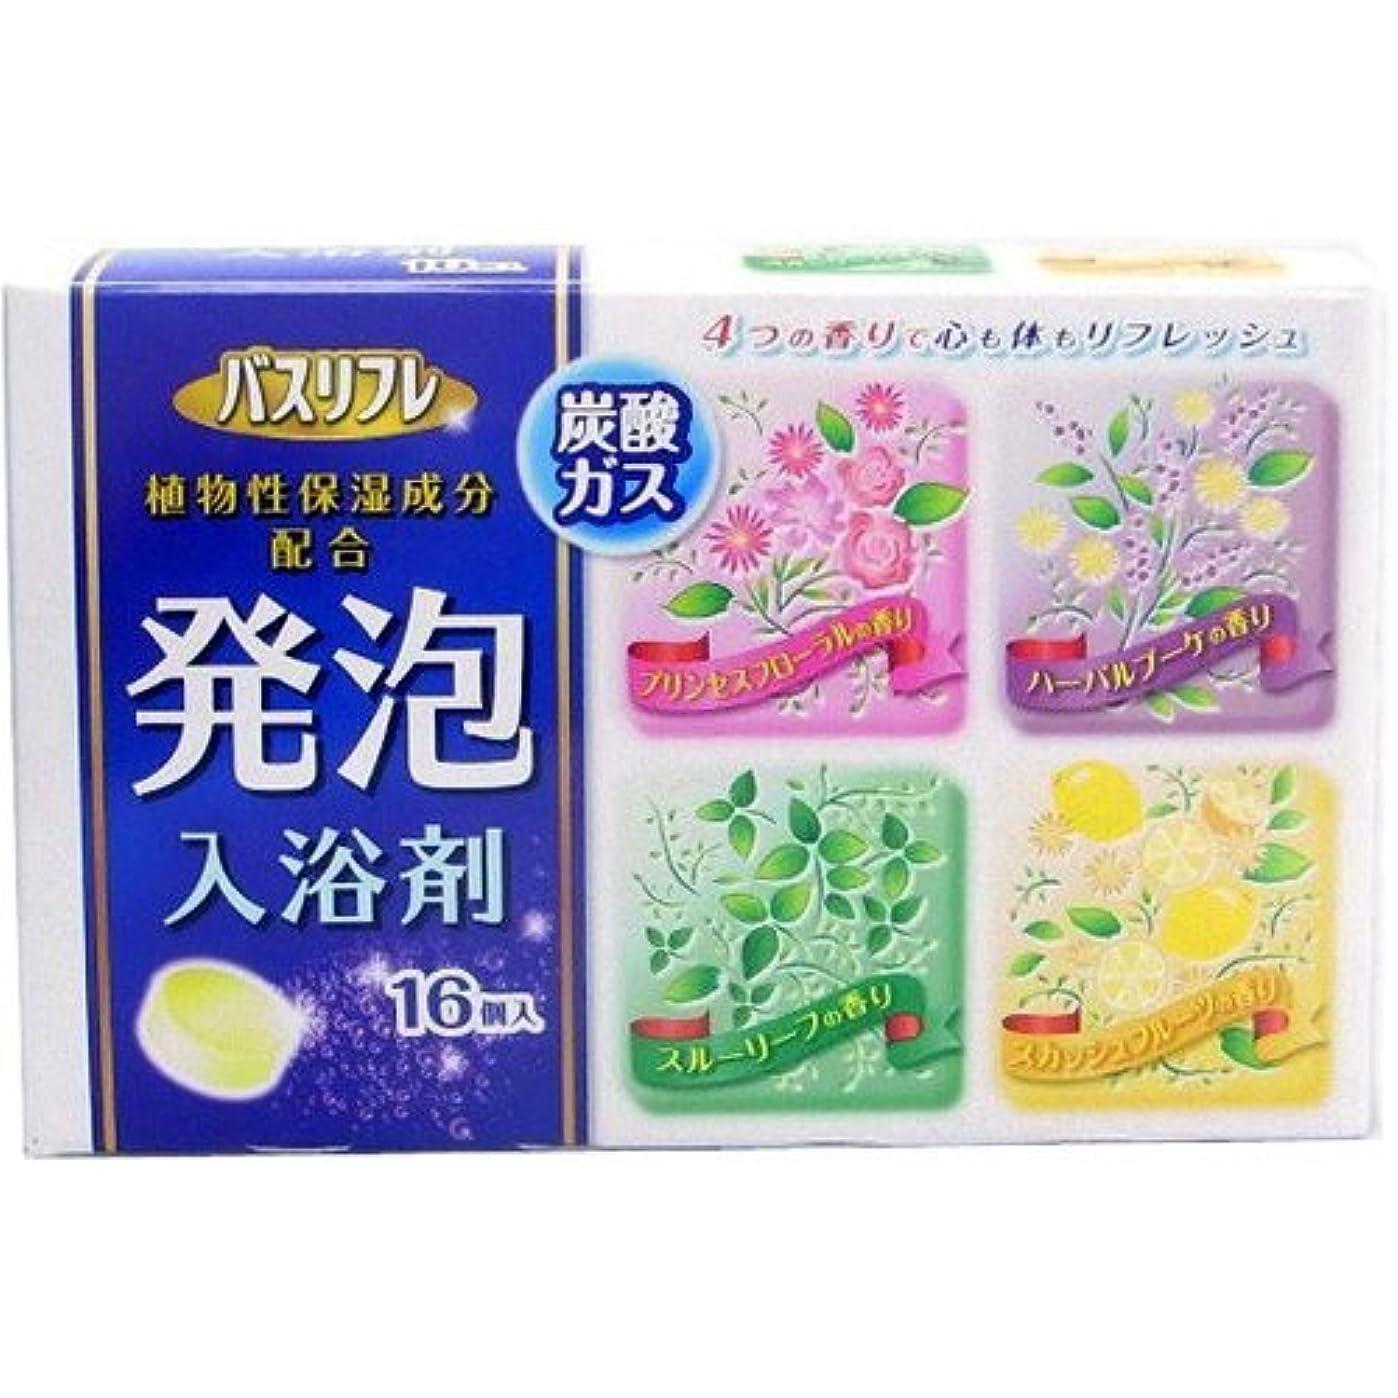 定数偏差極地バスリフレ 薬用発泡入浴剤 16錠 [医薬部外品] Japan